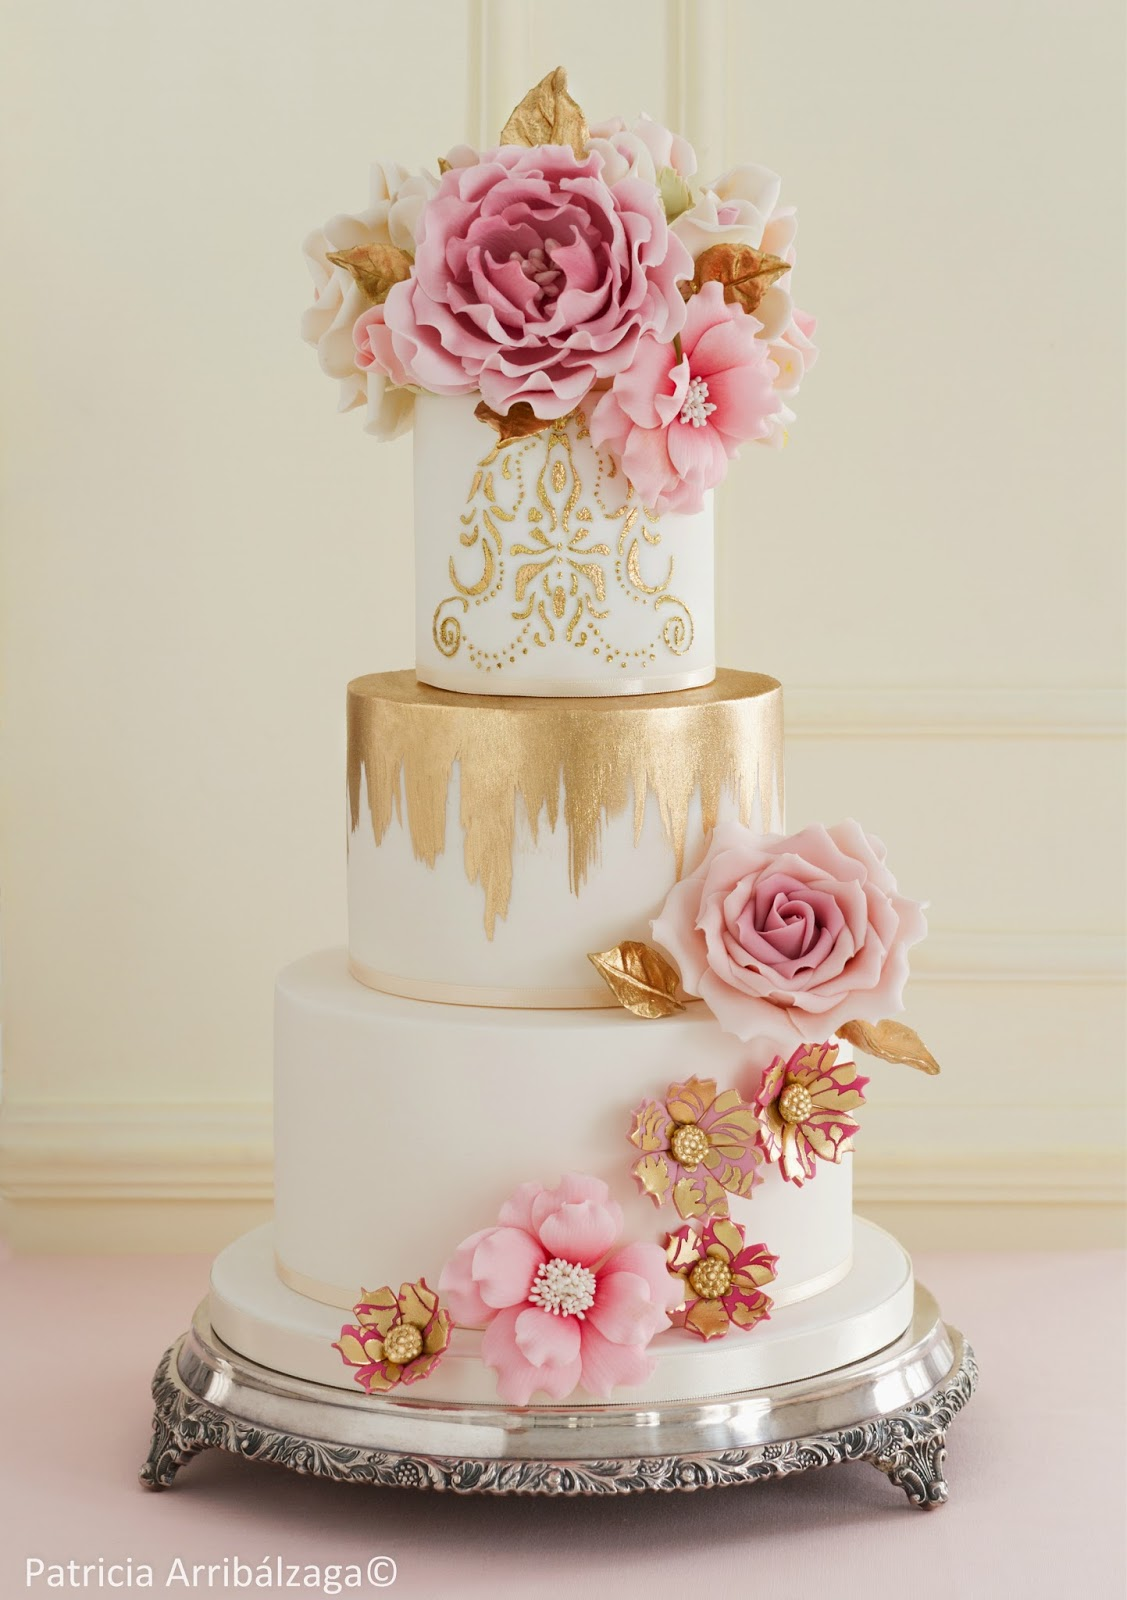 Wedding Cake with Golden Decor